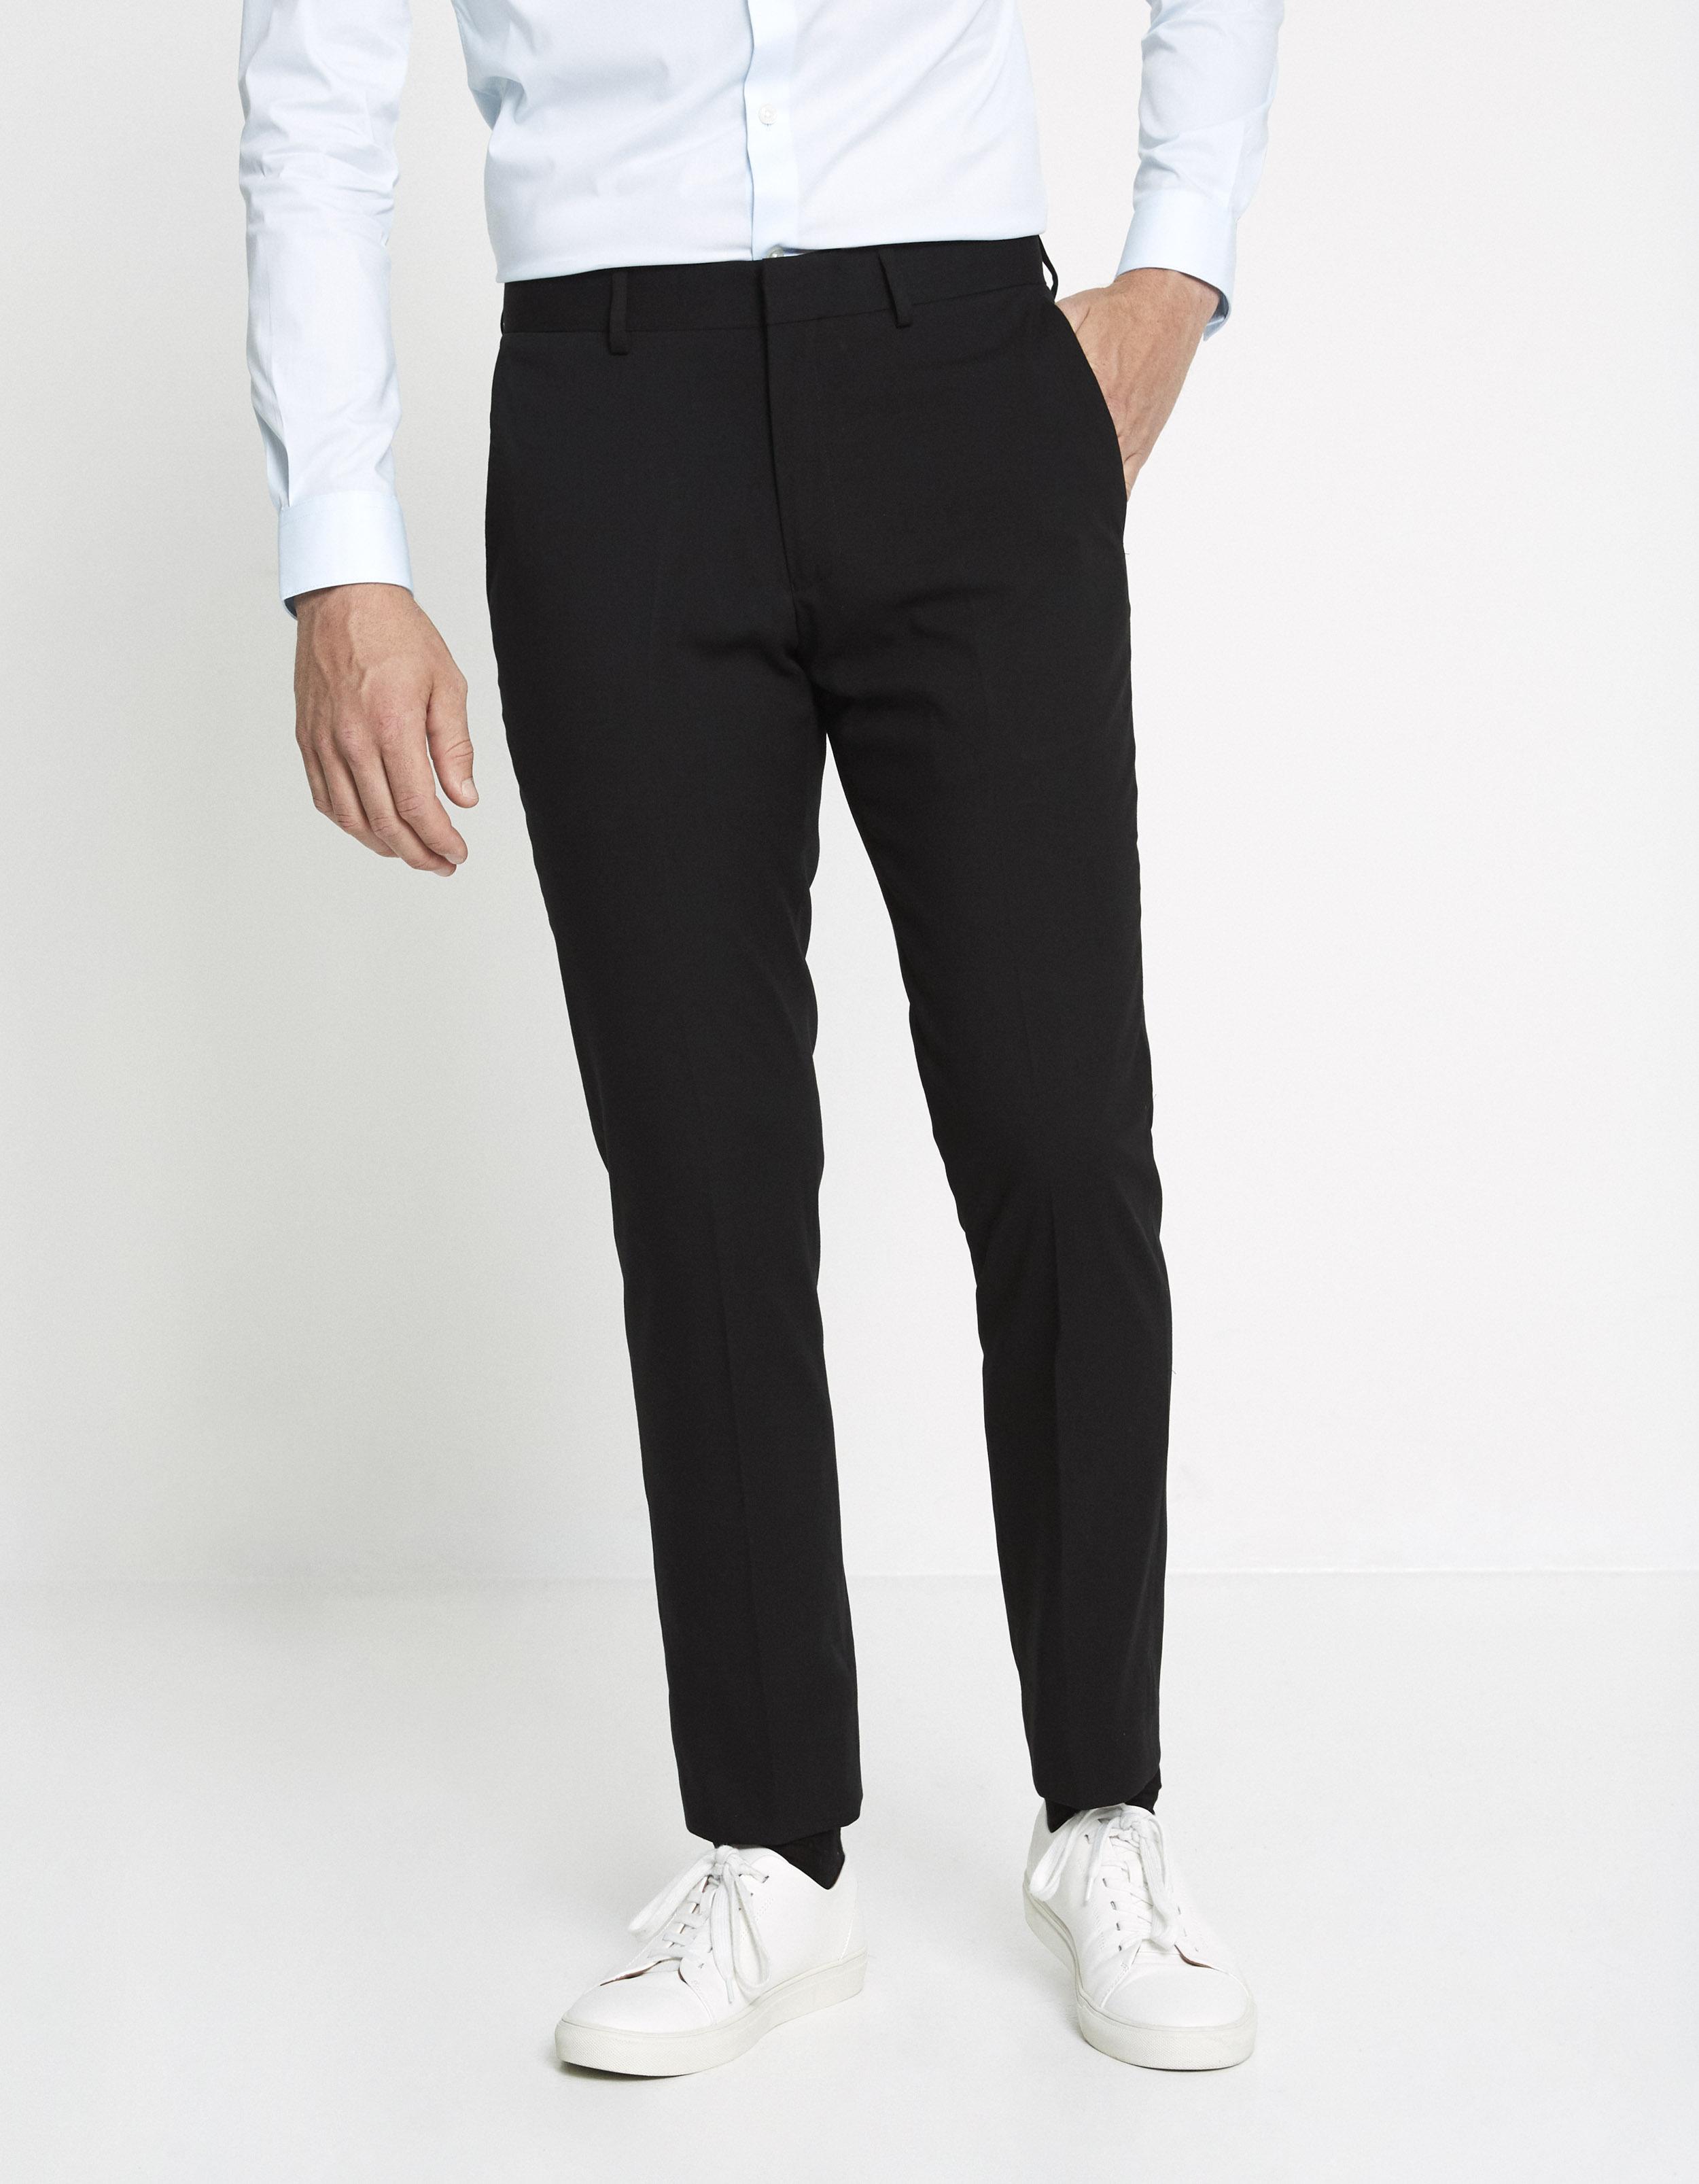 Pantalon PRIM slim extensible uni – noir Prix 39,99 €